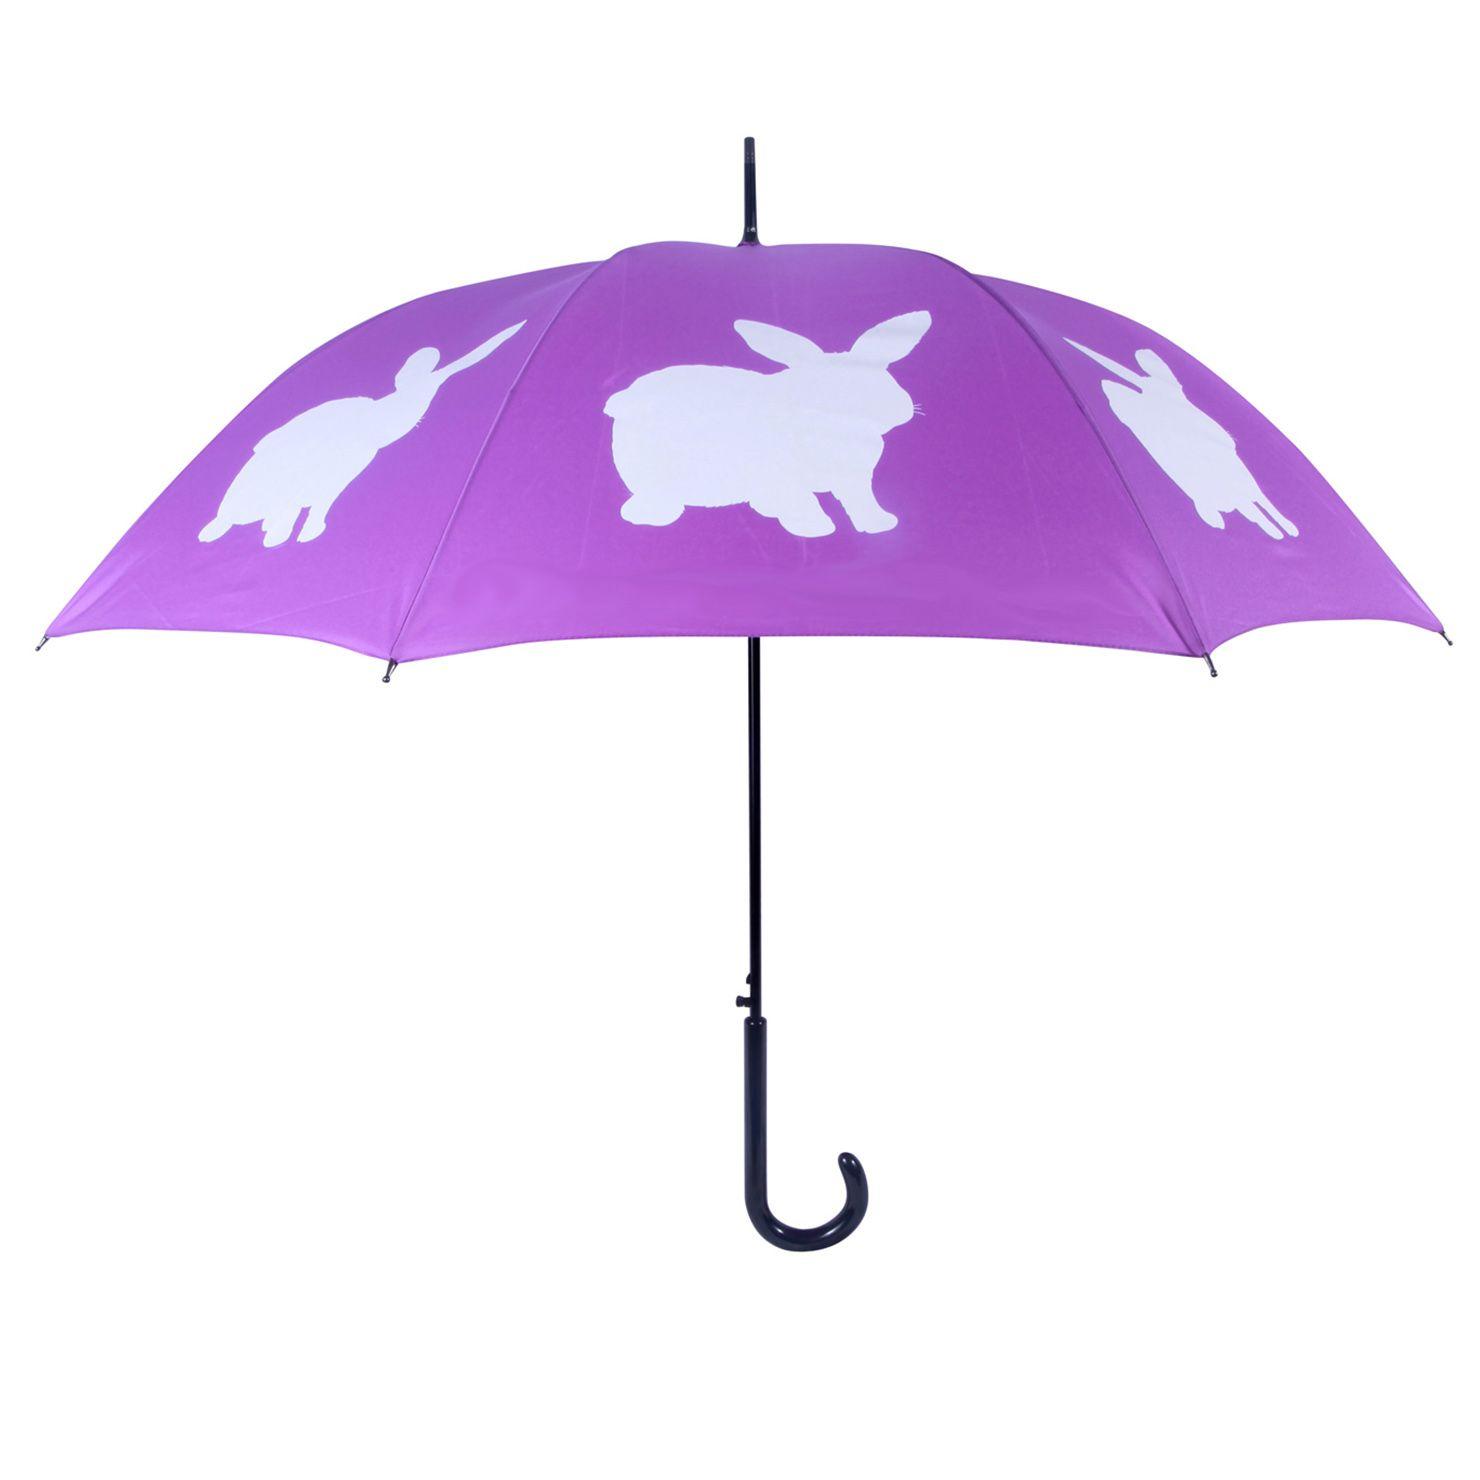 San Francisco Rabbit Walking Stick Umbrella, White on Purple | ACHICA